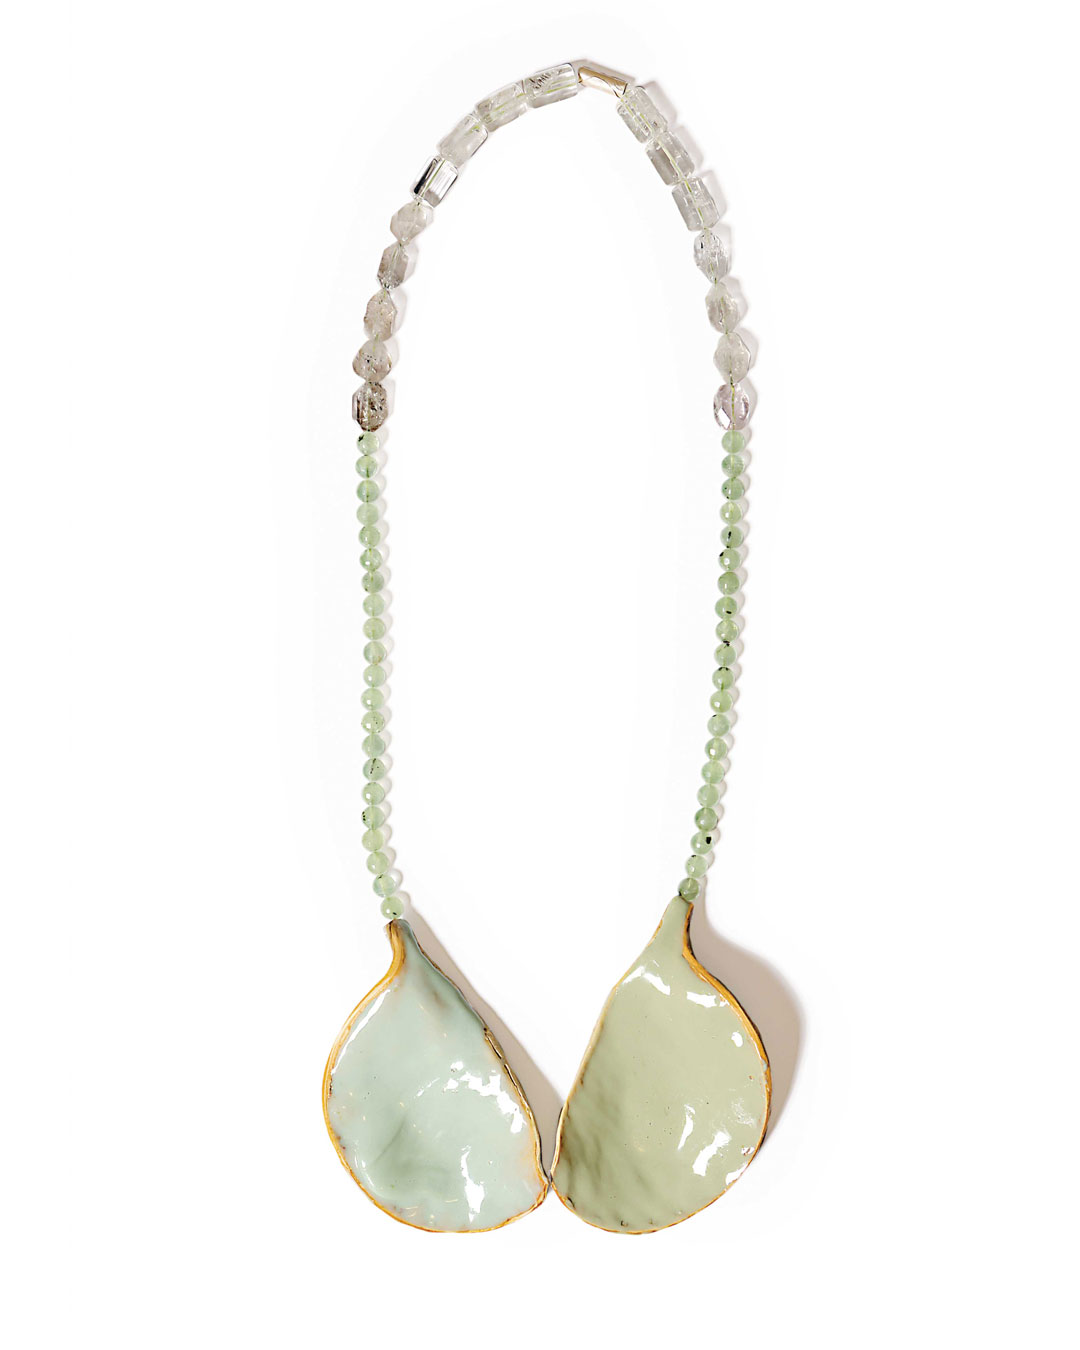 Margit Jäschke, untitled, 2012, necklace; wood, plastic, rock crystal, 480 x 155 x 35 mm, €2670